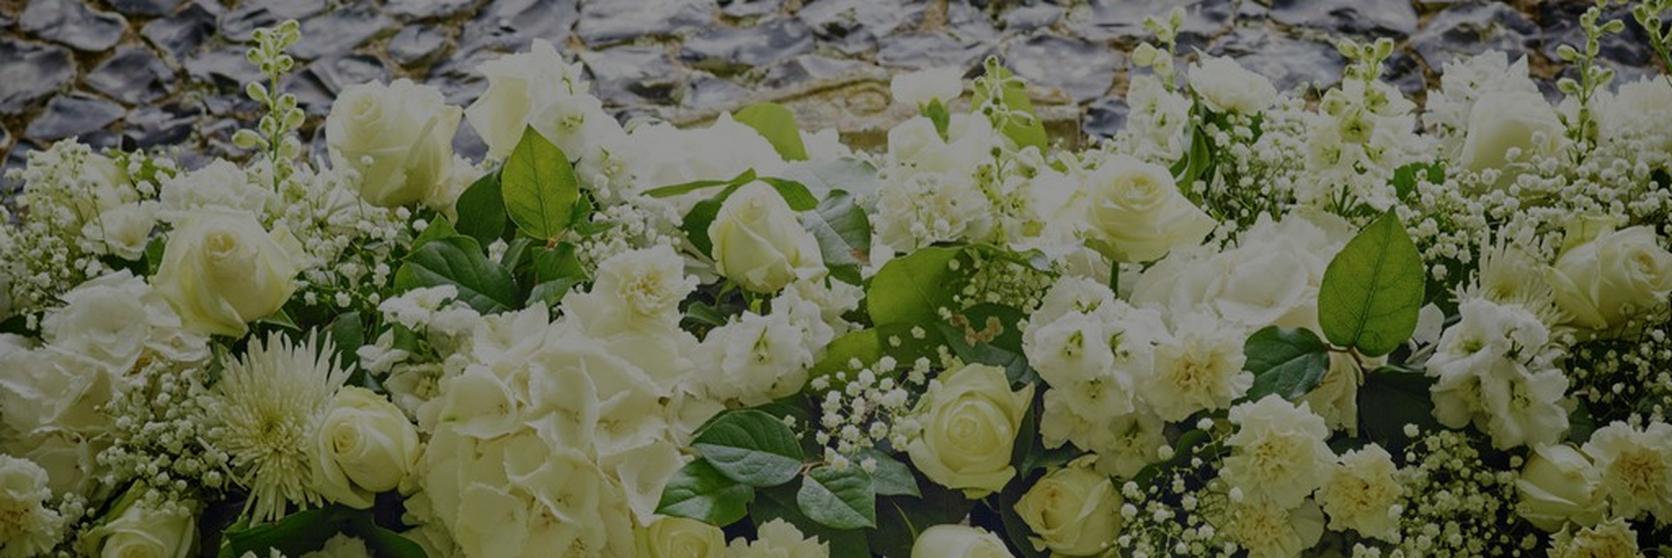 Meghan-markles-wedding-flowers-1